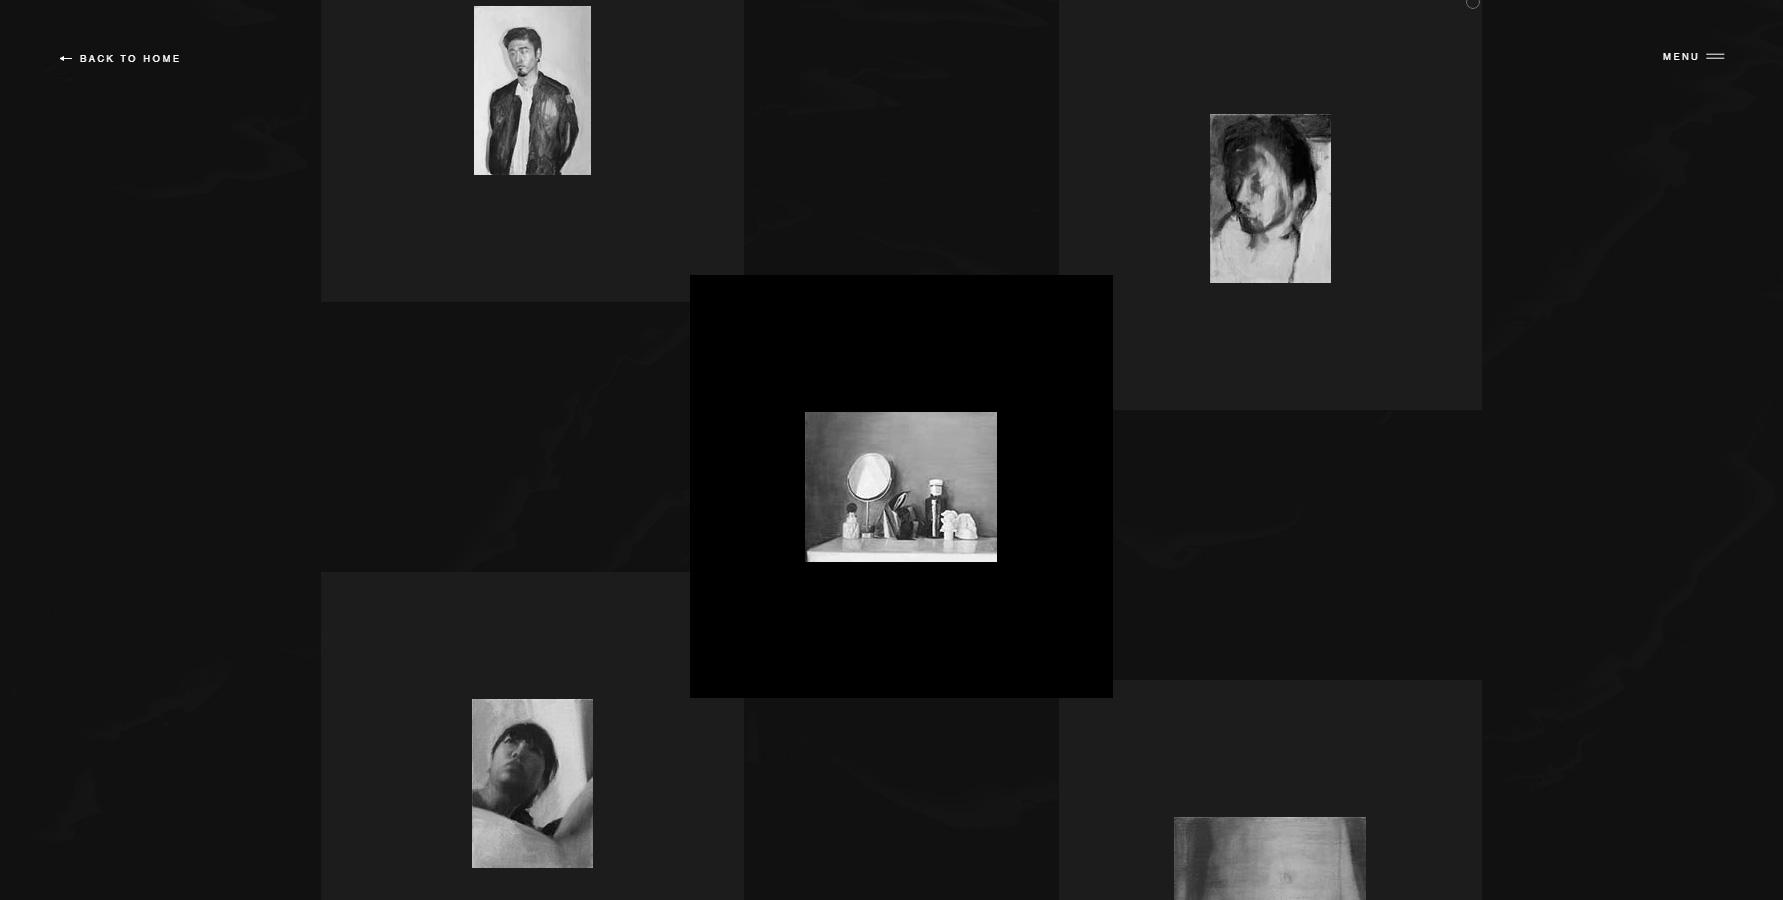 Ryo Kawada - Website of the Day